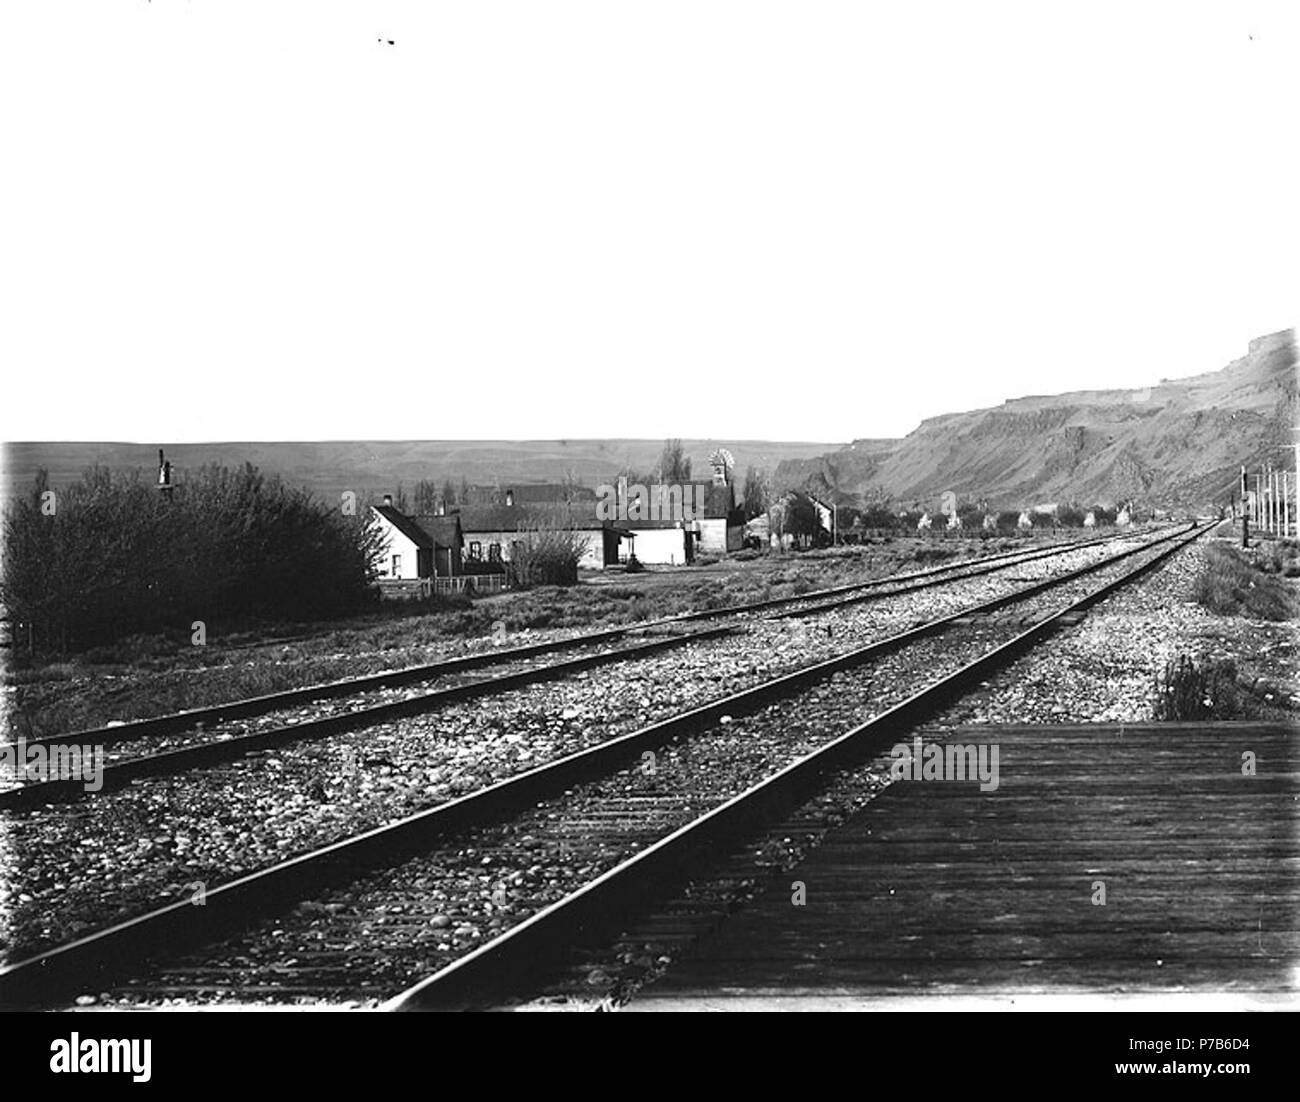 English: Spokane, Portland & Seattle Railway tracks at